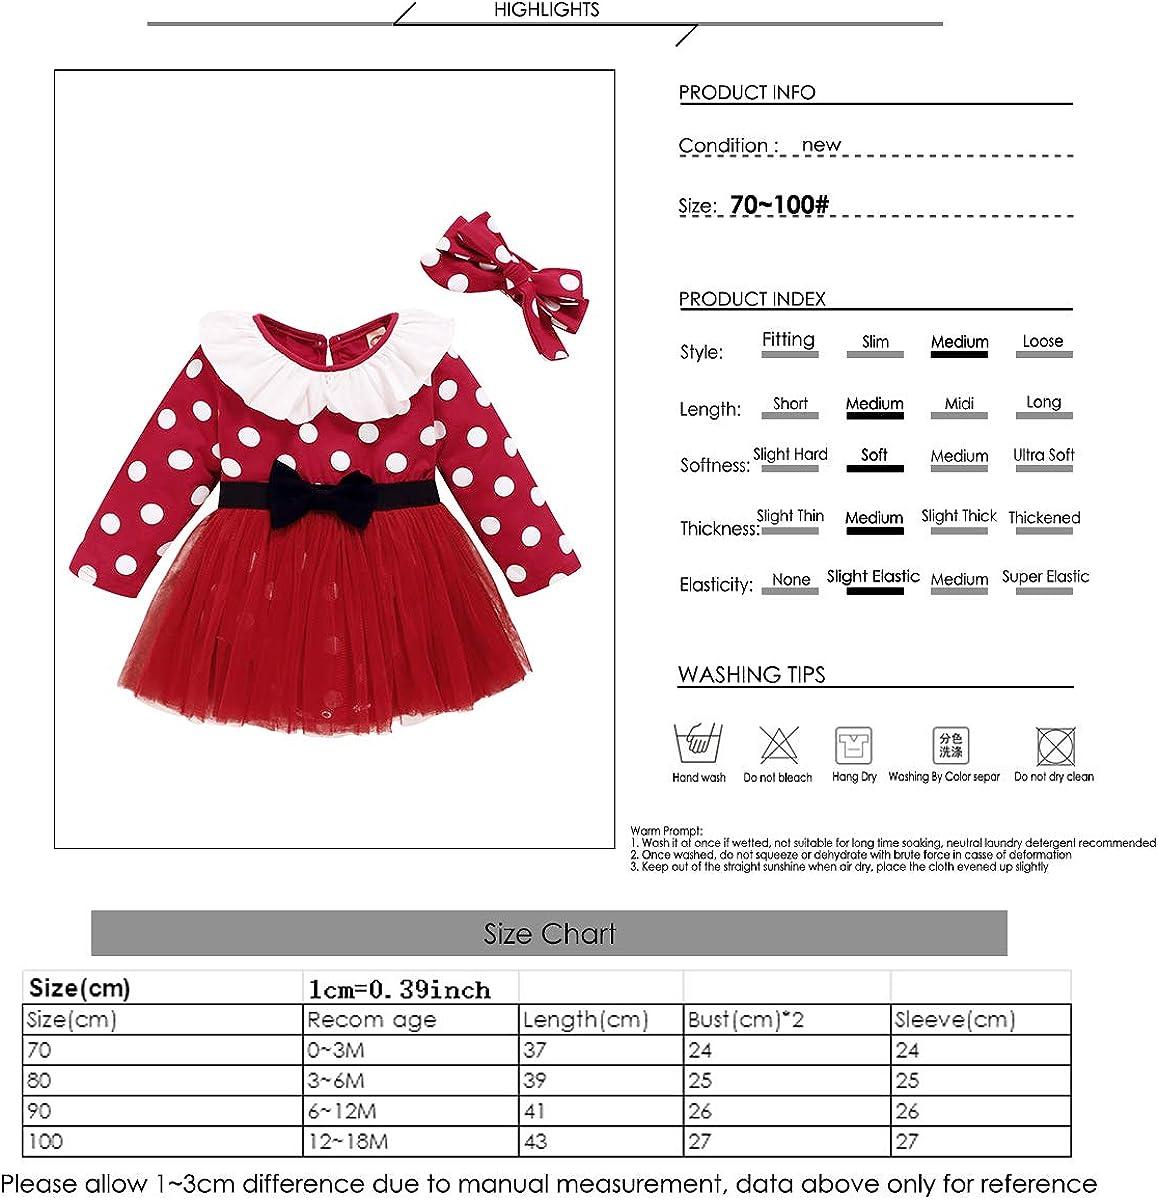 DaMohony Newborn Baby Dress Toddler Long Sleeve Polka Dotted Mesh Dress with Headband